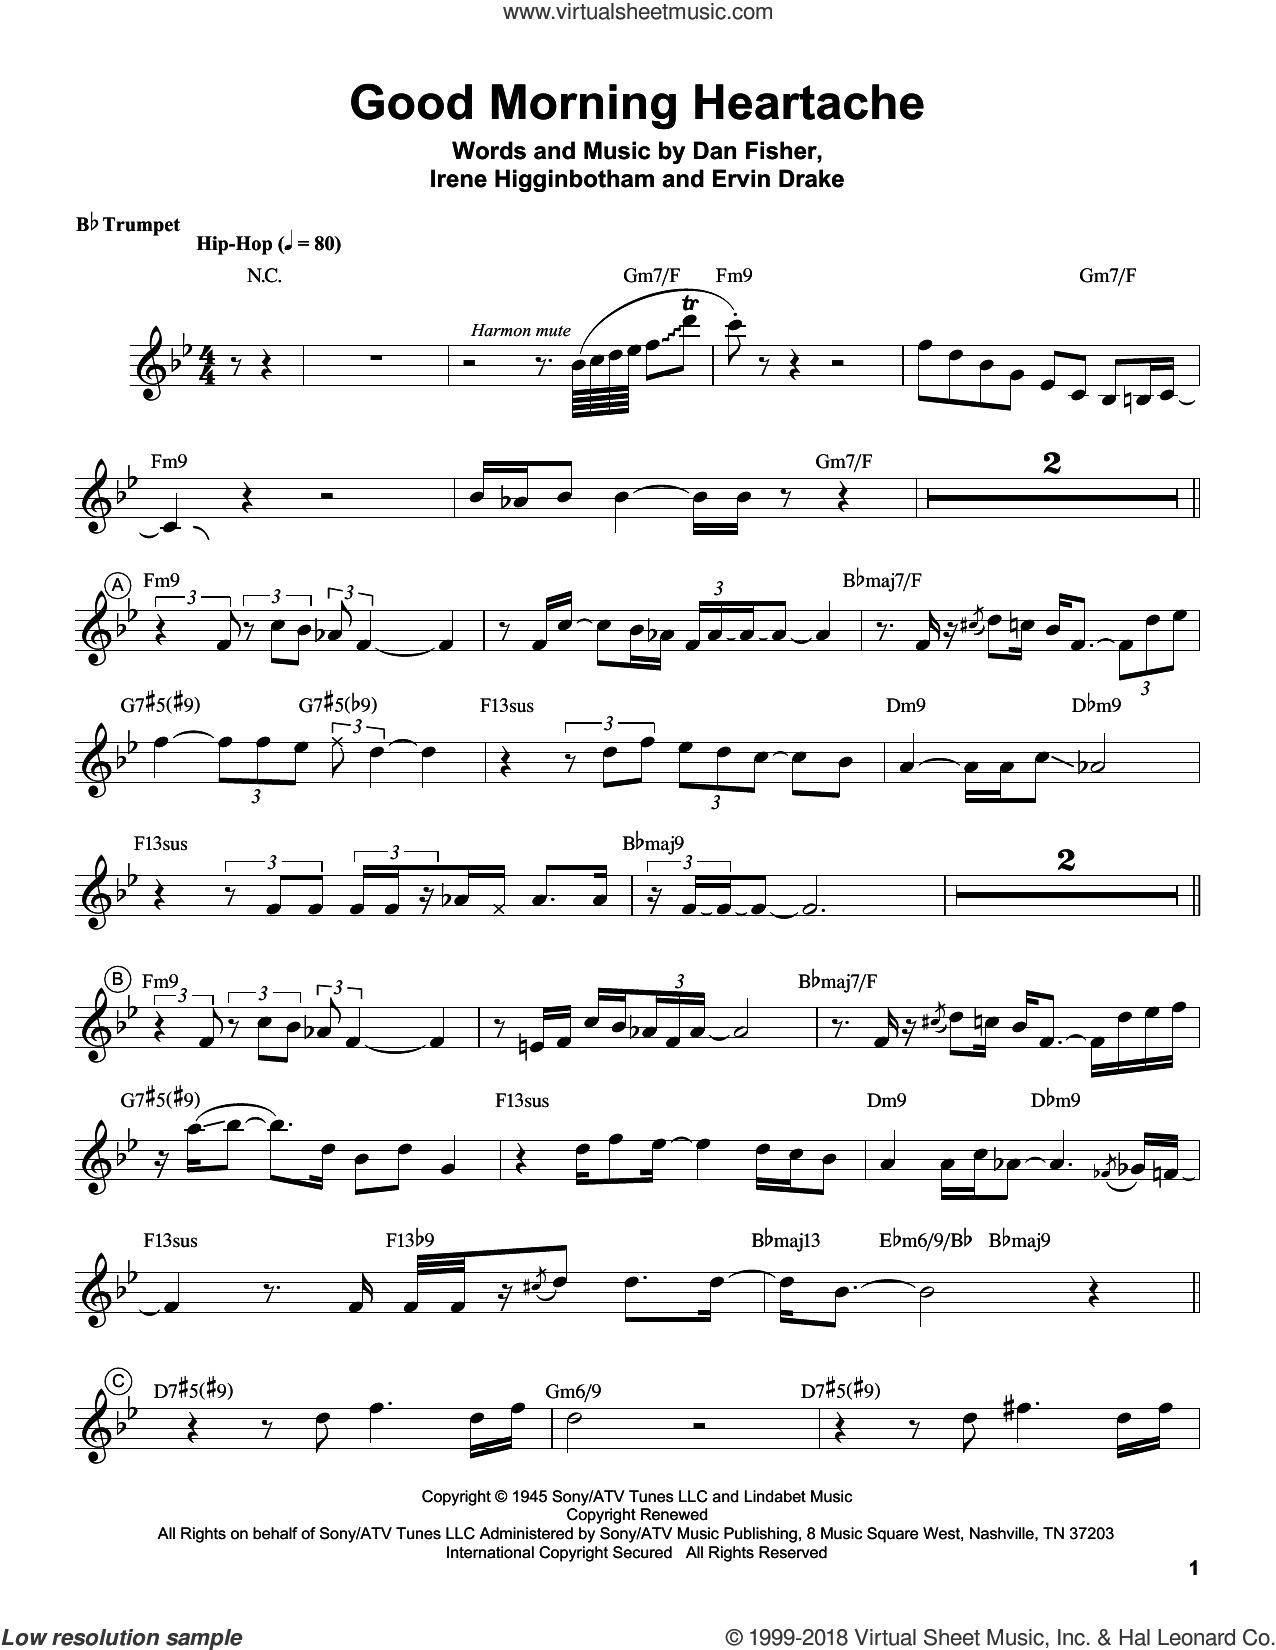 Good Morning Heartache sheet music for trumpet solo (transcription) by Chris Botti, Billie Holiday, Diana Ross, Dan Fisher, Ervin Drake and Irene Higginbotham, intermediate trumpet (transcription)